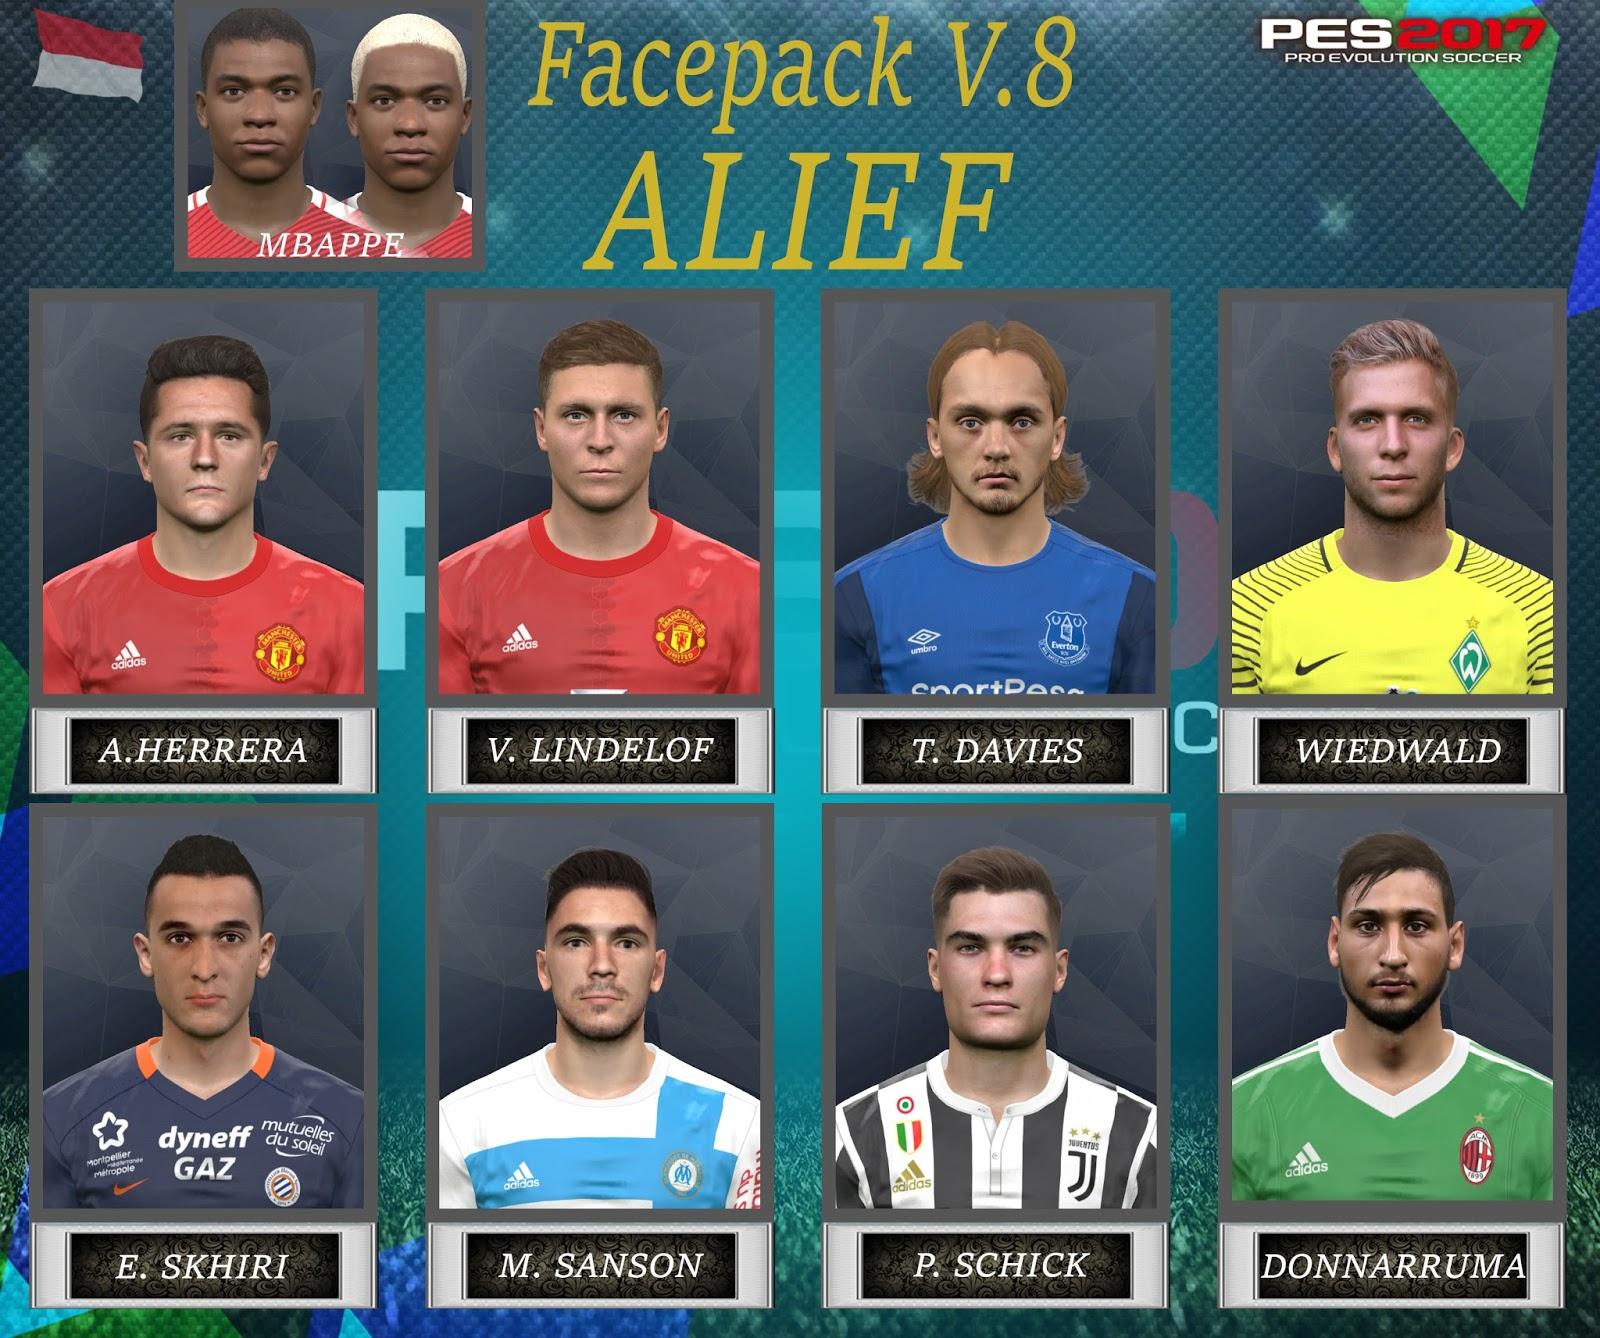 PES 2017 Facepack v. 8 by Alief